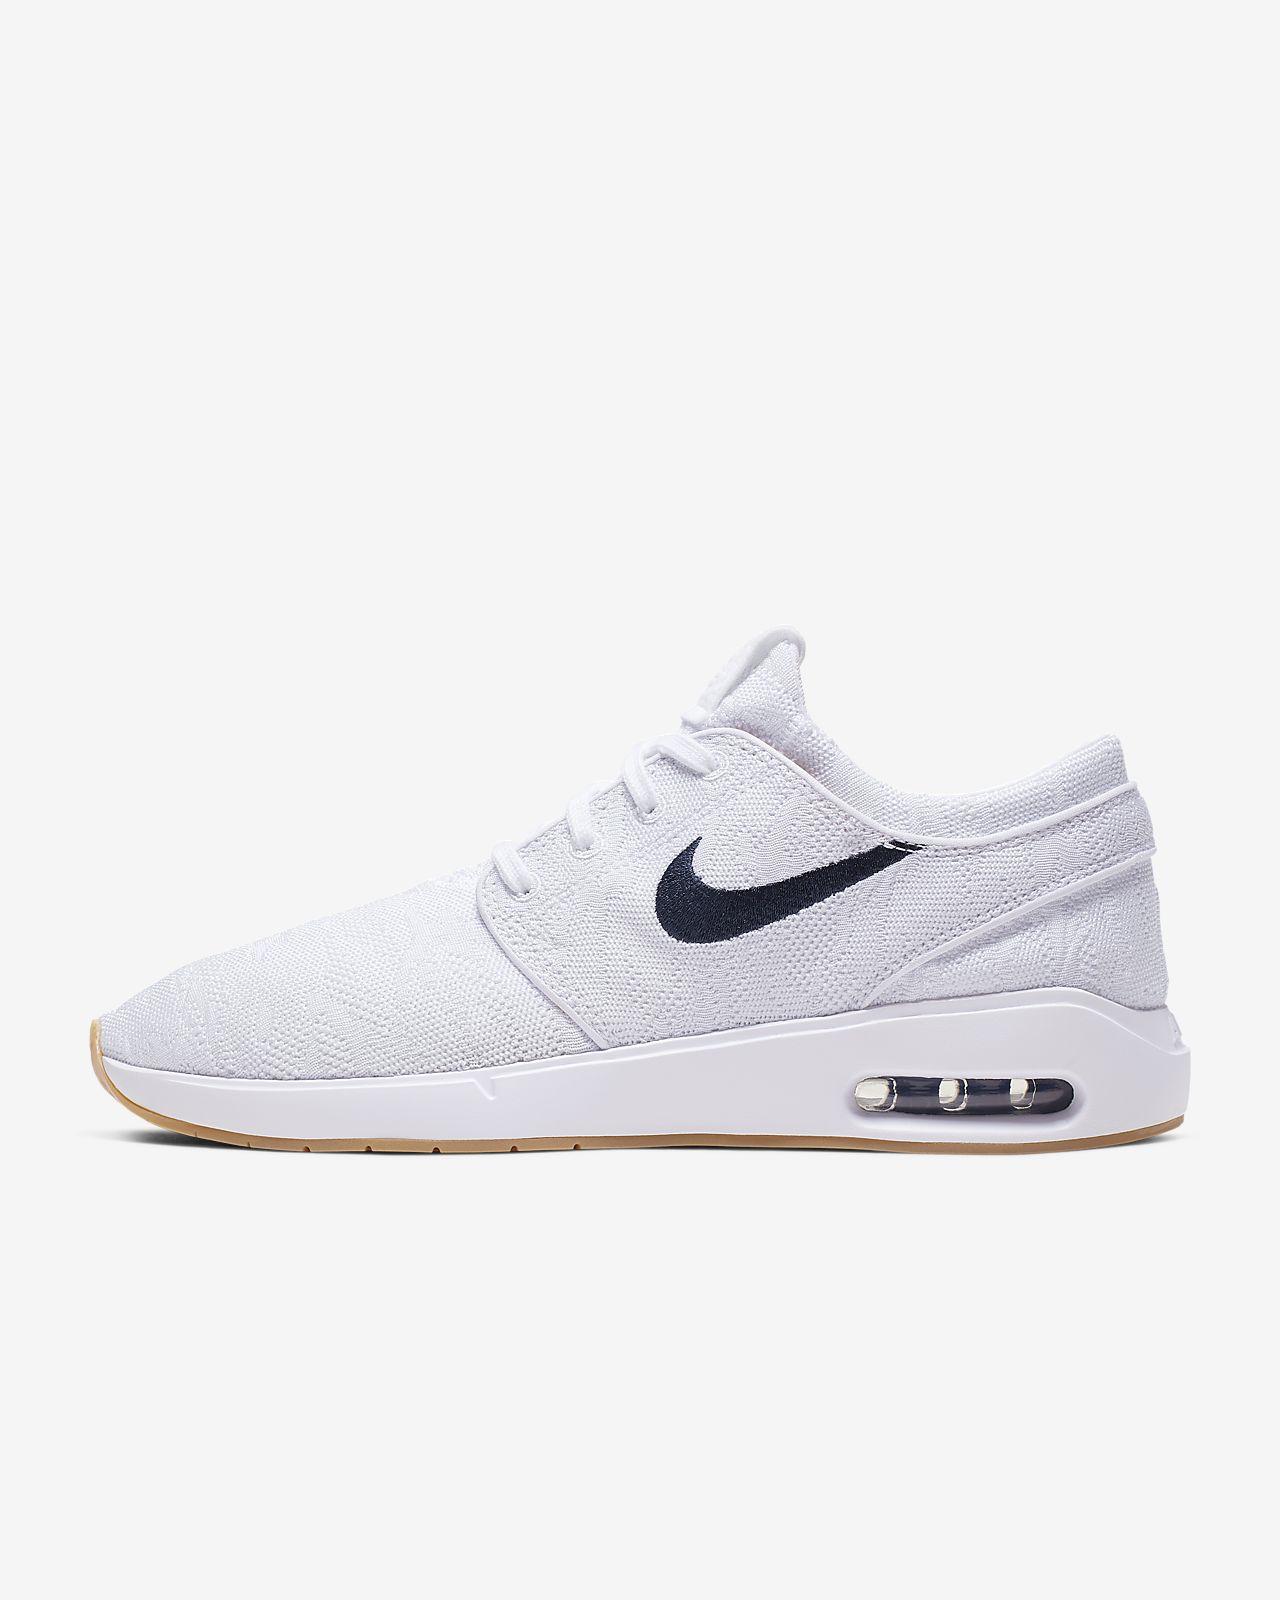 Мужская обувь для скейтбординга Nike SB Air Max Stefan Janoski 2